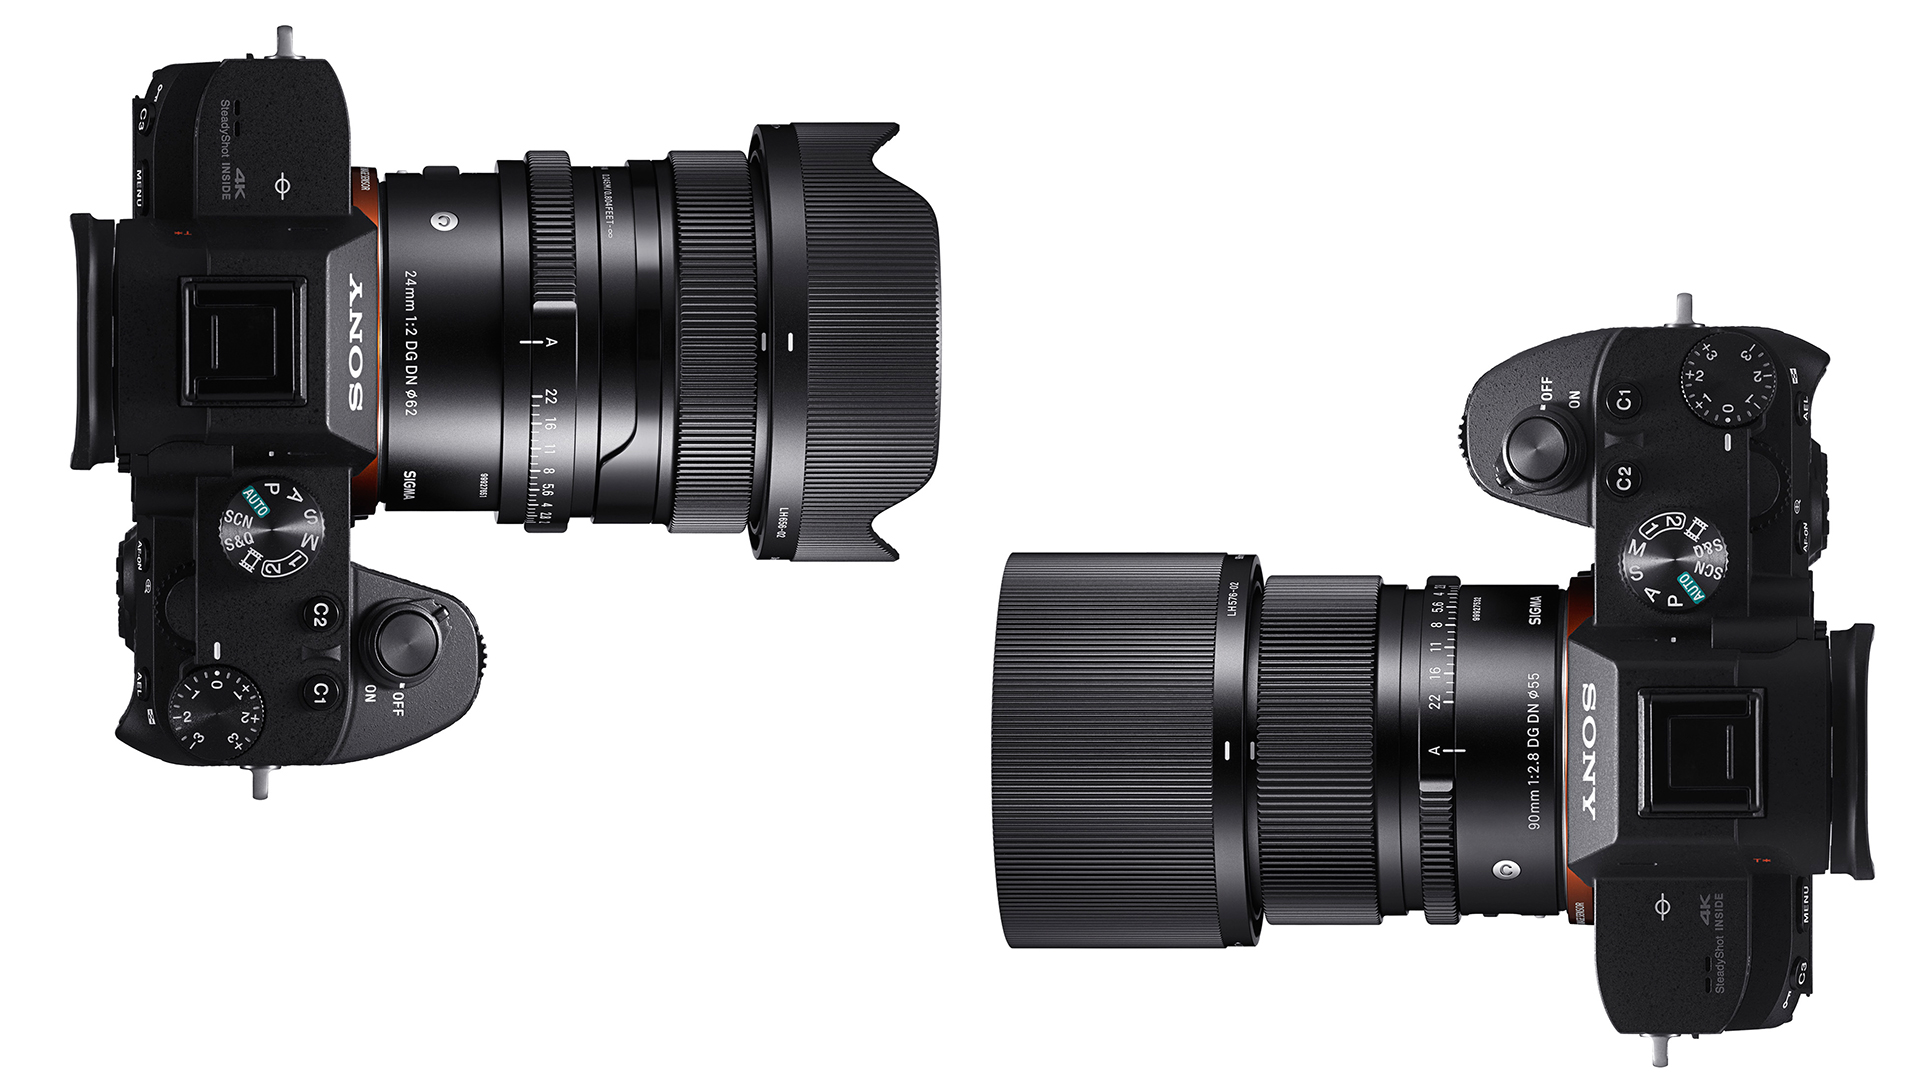 Объективы Sigma 24mm f/2 и 90mm f/2.8 установлены на камеры Sony